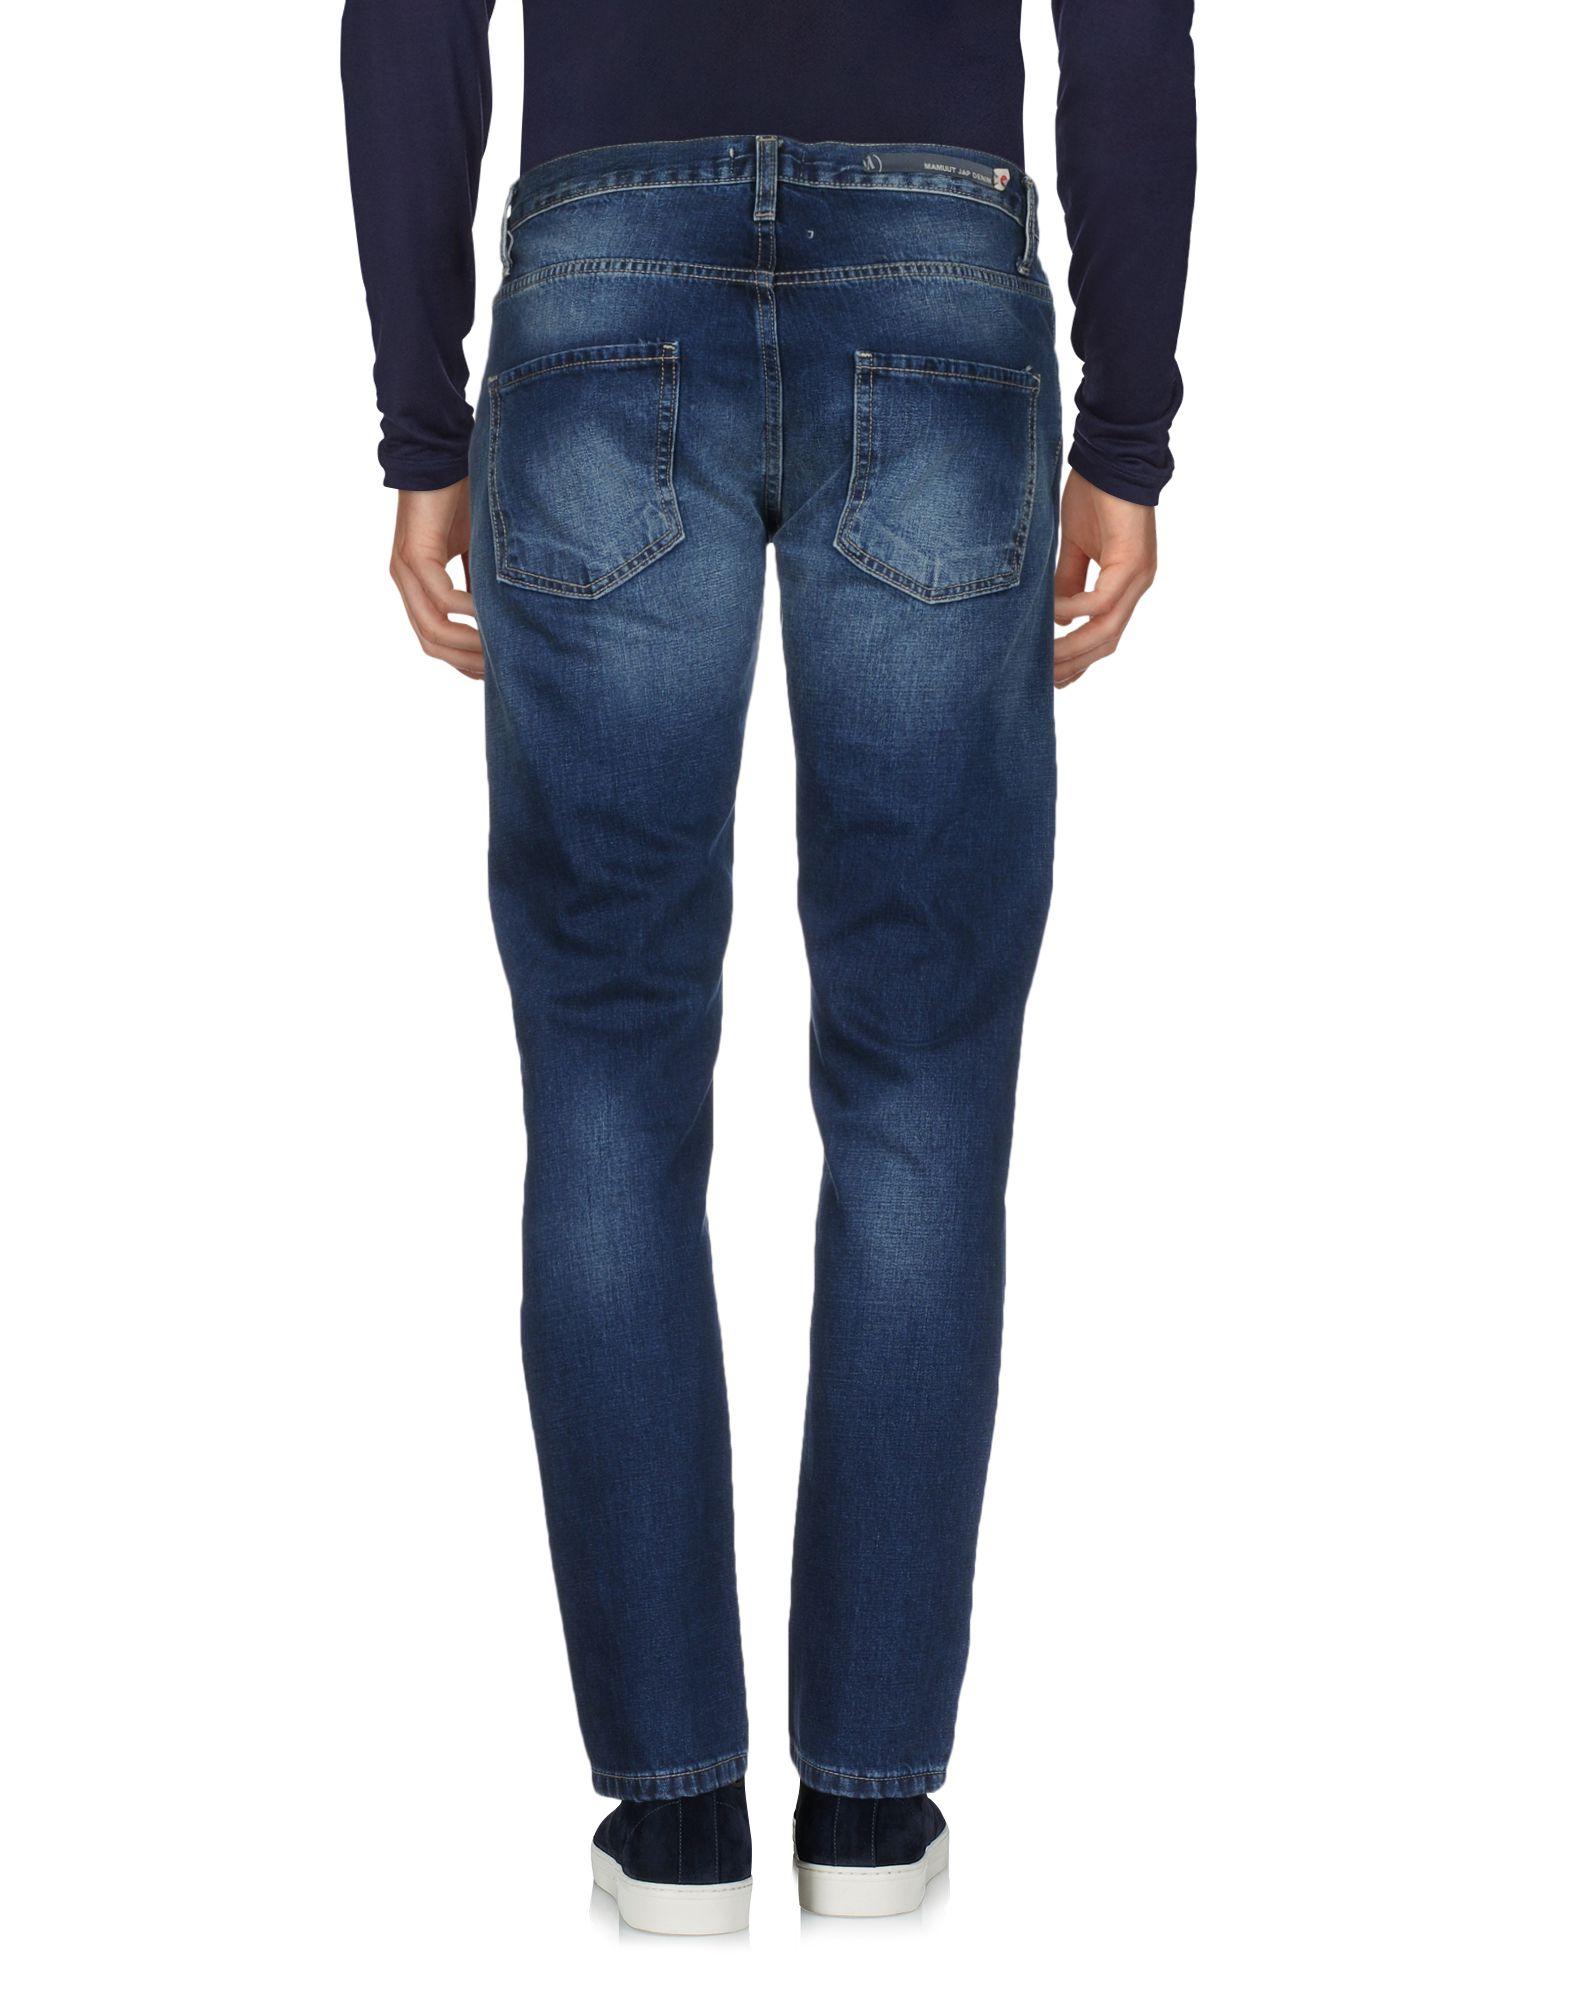 Pantaloni Jeans (M) Mamuut Denim Uomo - - - 42665997UN 43dda2